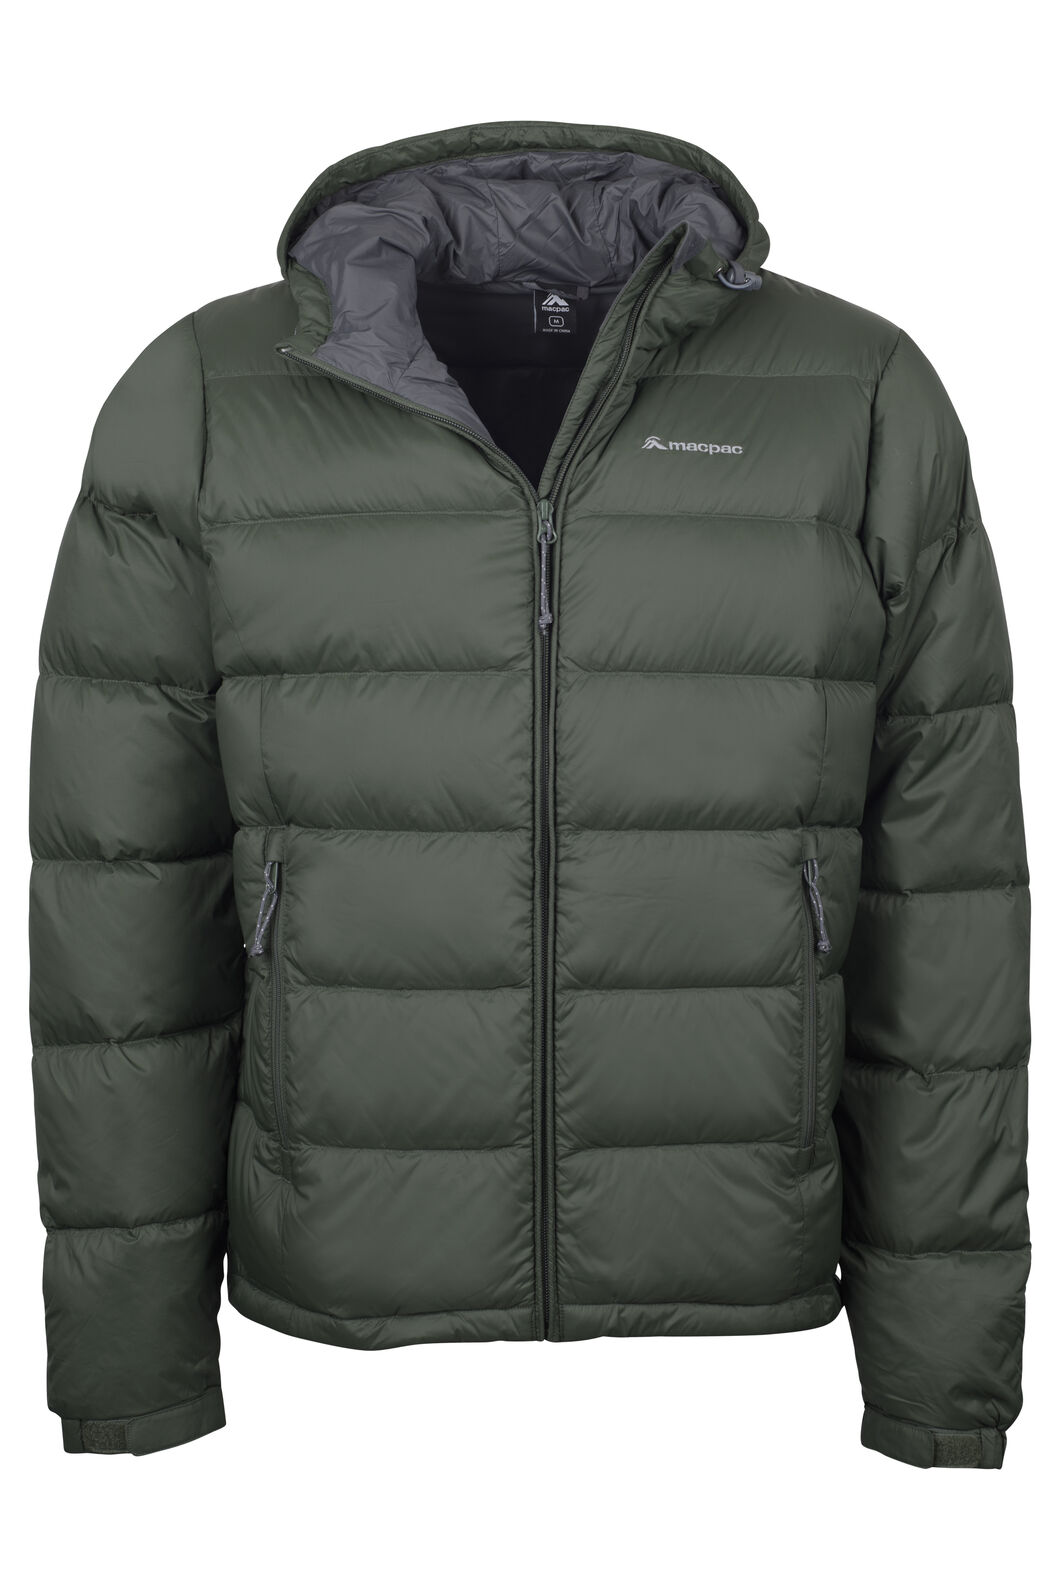 Macpac Halo Hooded Down Jacket — Men's, Kombu Green, hi-res